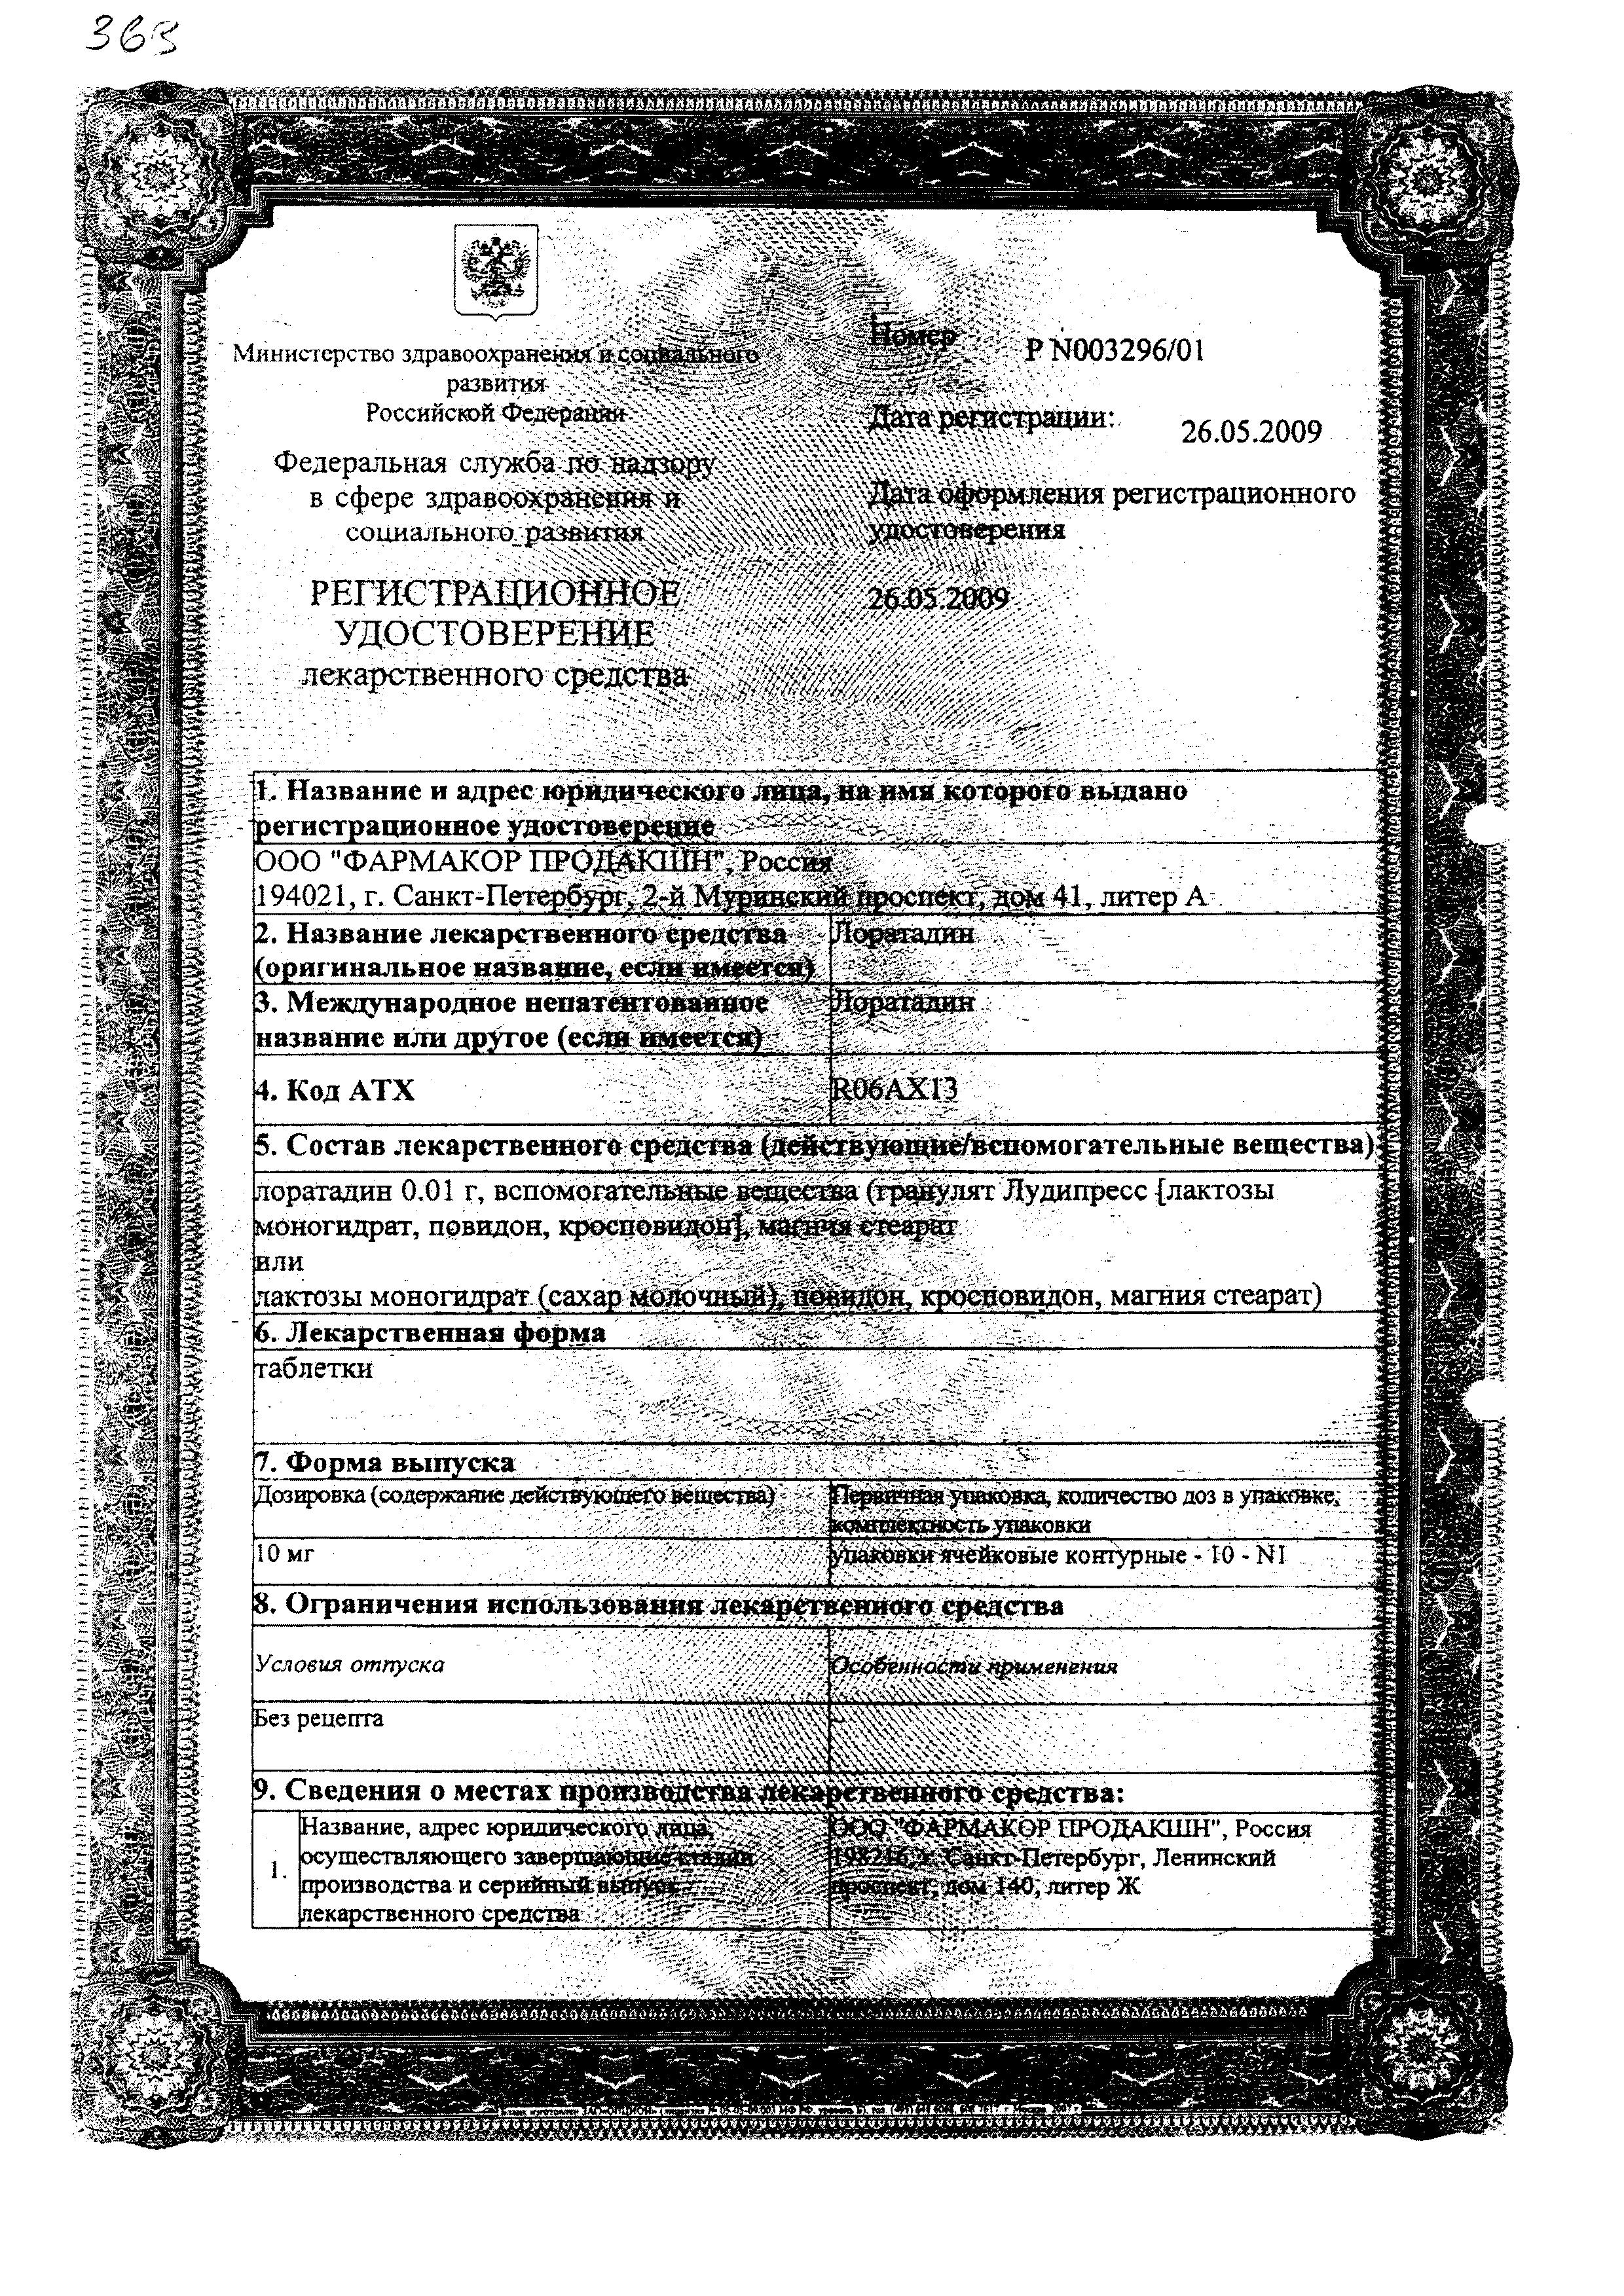 Лоратадин сертификат